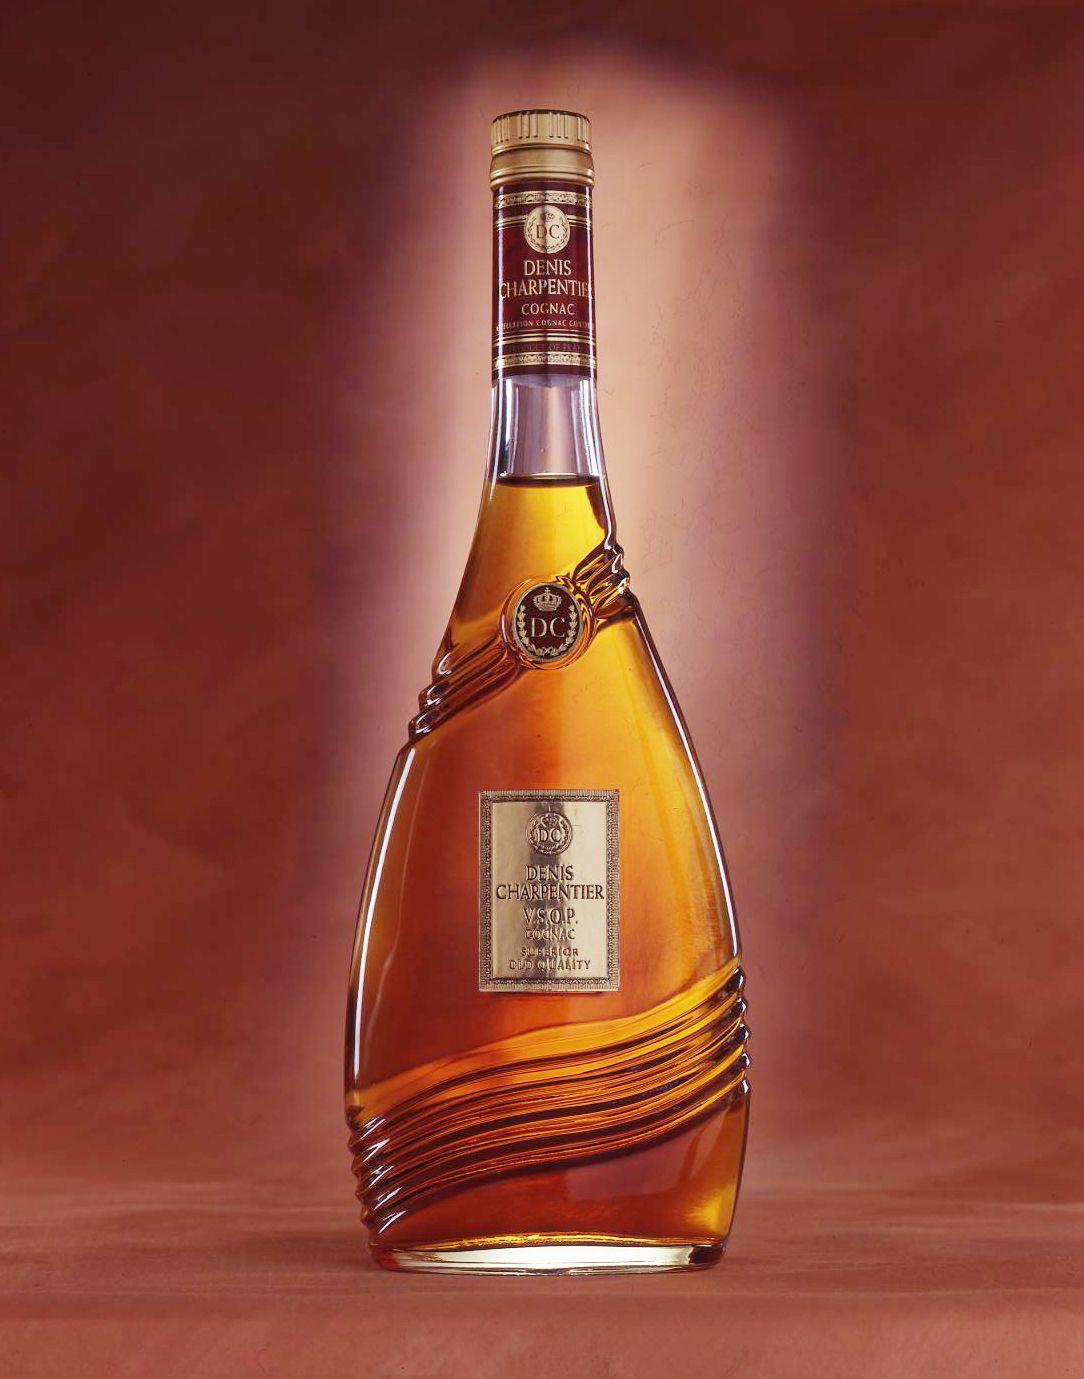 Denis Charpentier Vsop Superior Cognac Memento Linea Liquor Bottles Bottle Strong Drinks